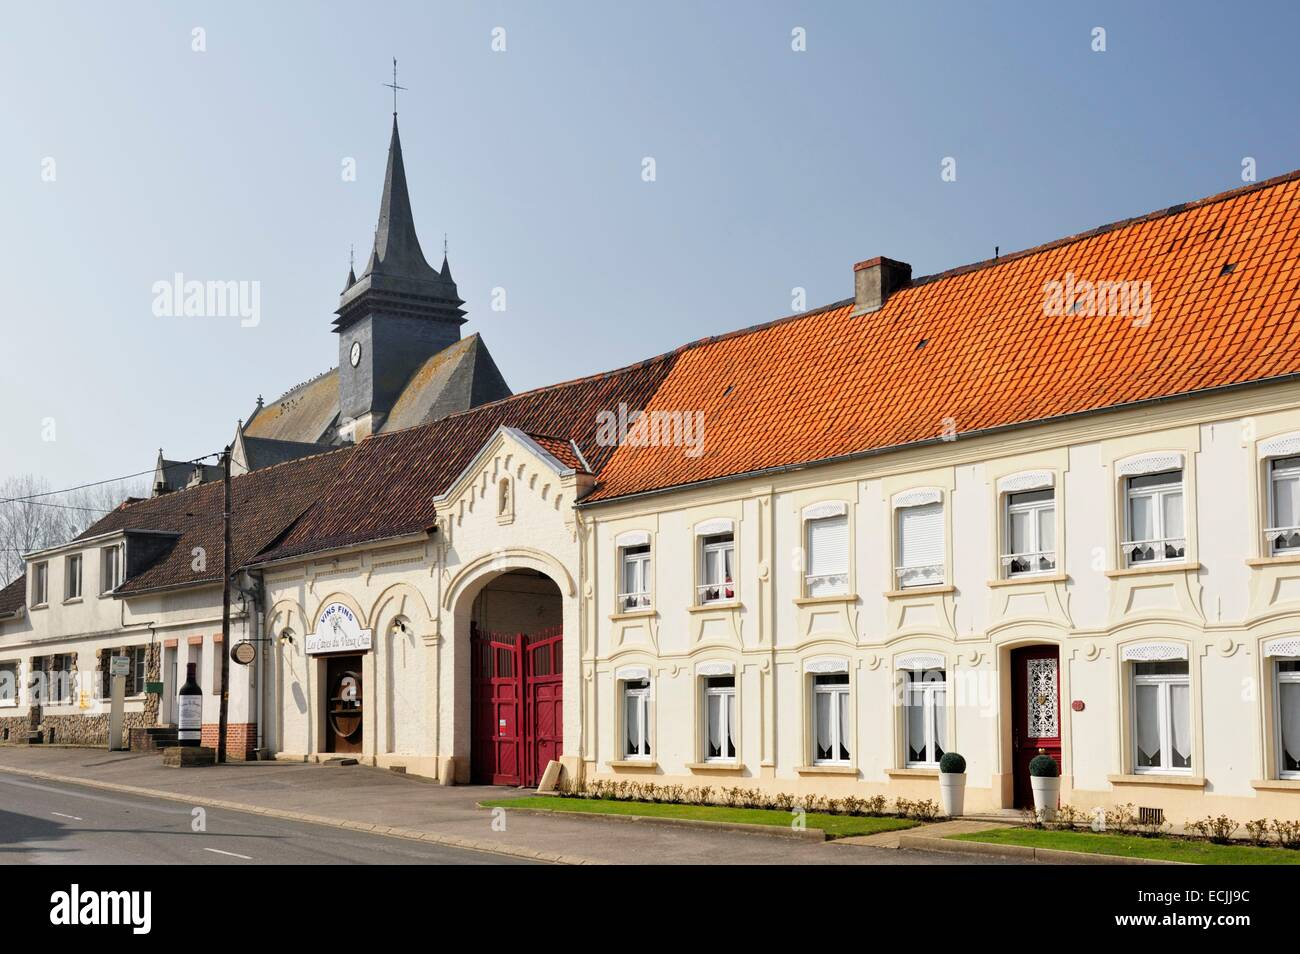 France, Pas de Calais, Fressin, flamboyant Gothic style Church Saint Martin behind the main street - Stock Image